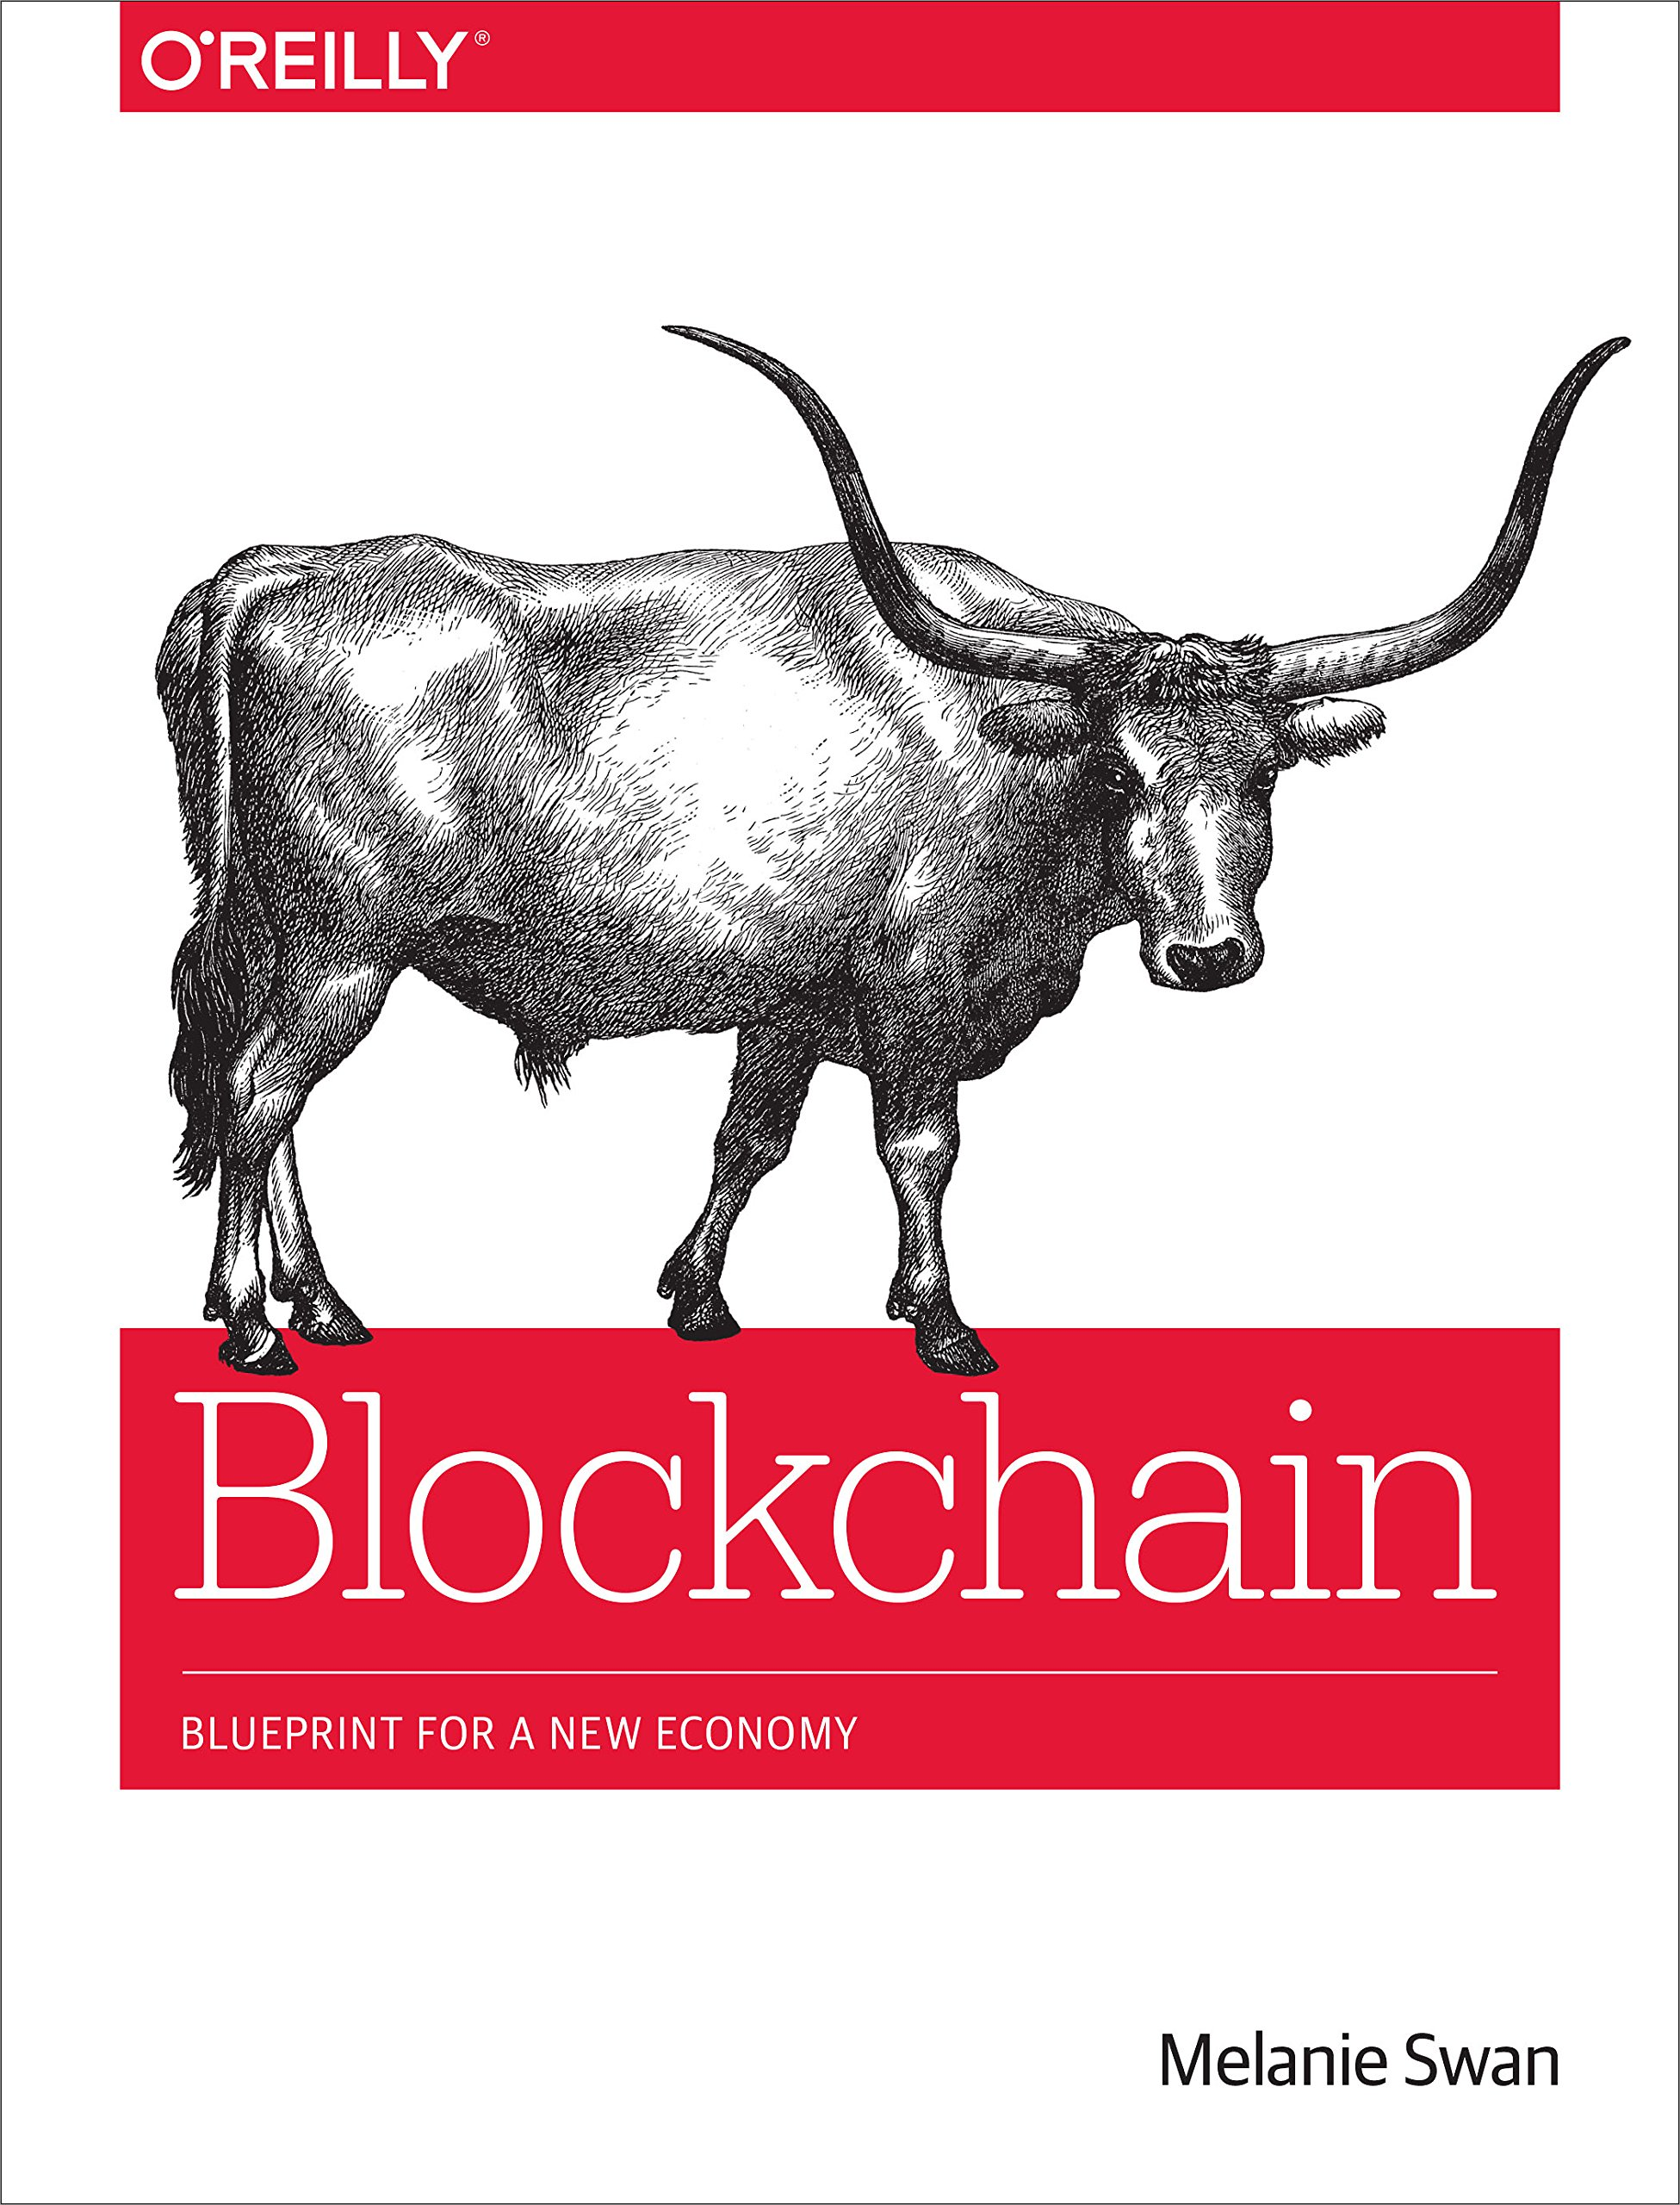 Blockchain: Blueprint for a New Economy - Melanie Swan - отзывы на аудиокнигу